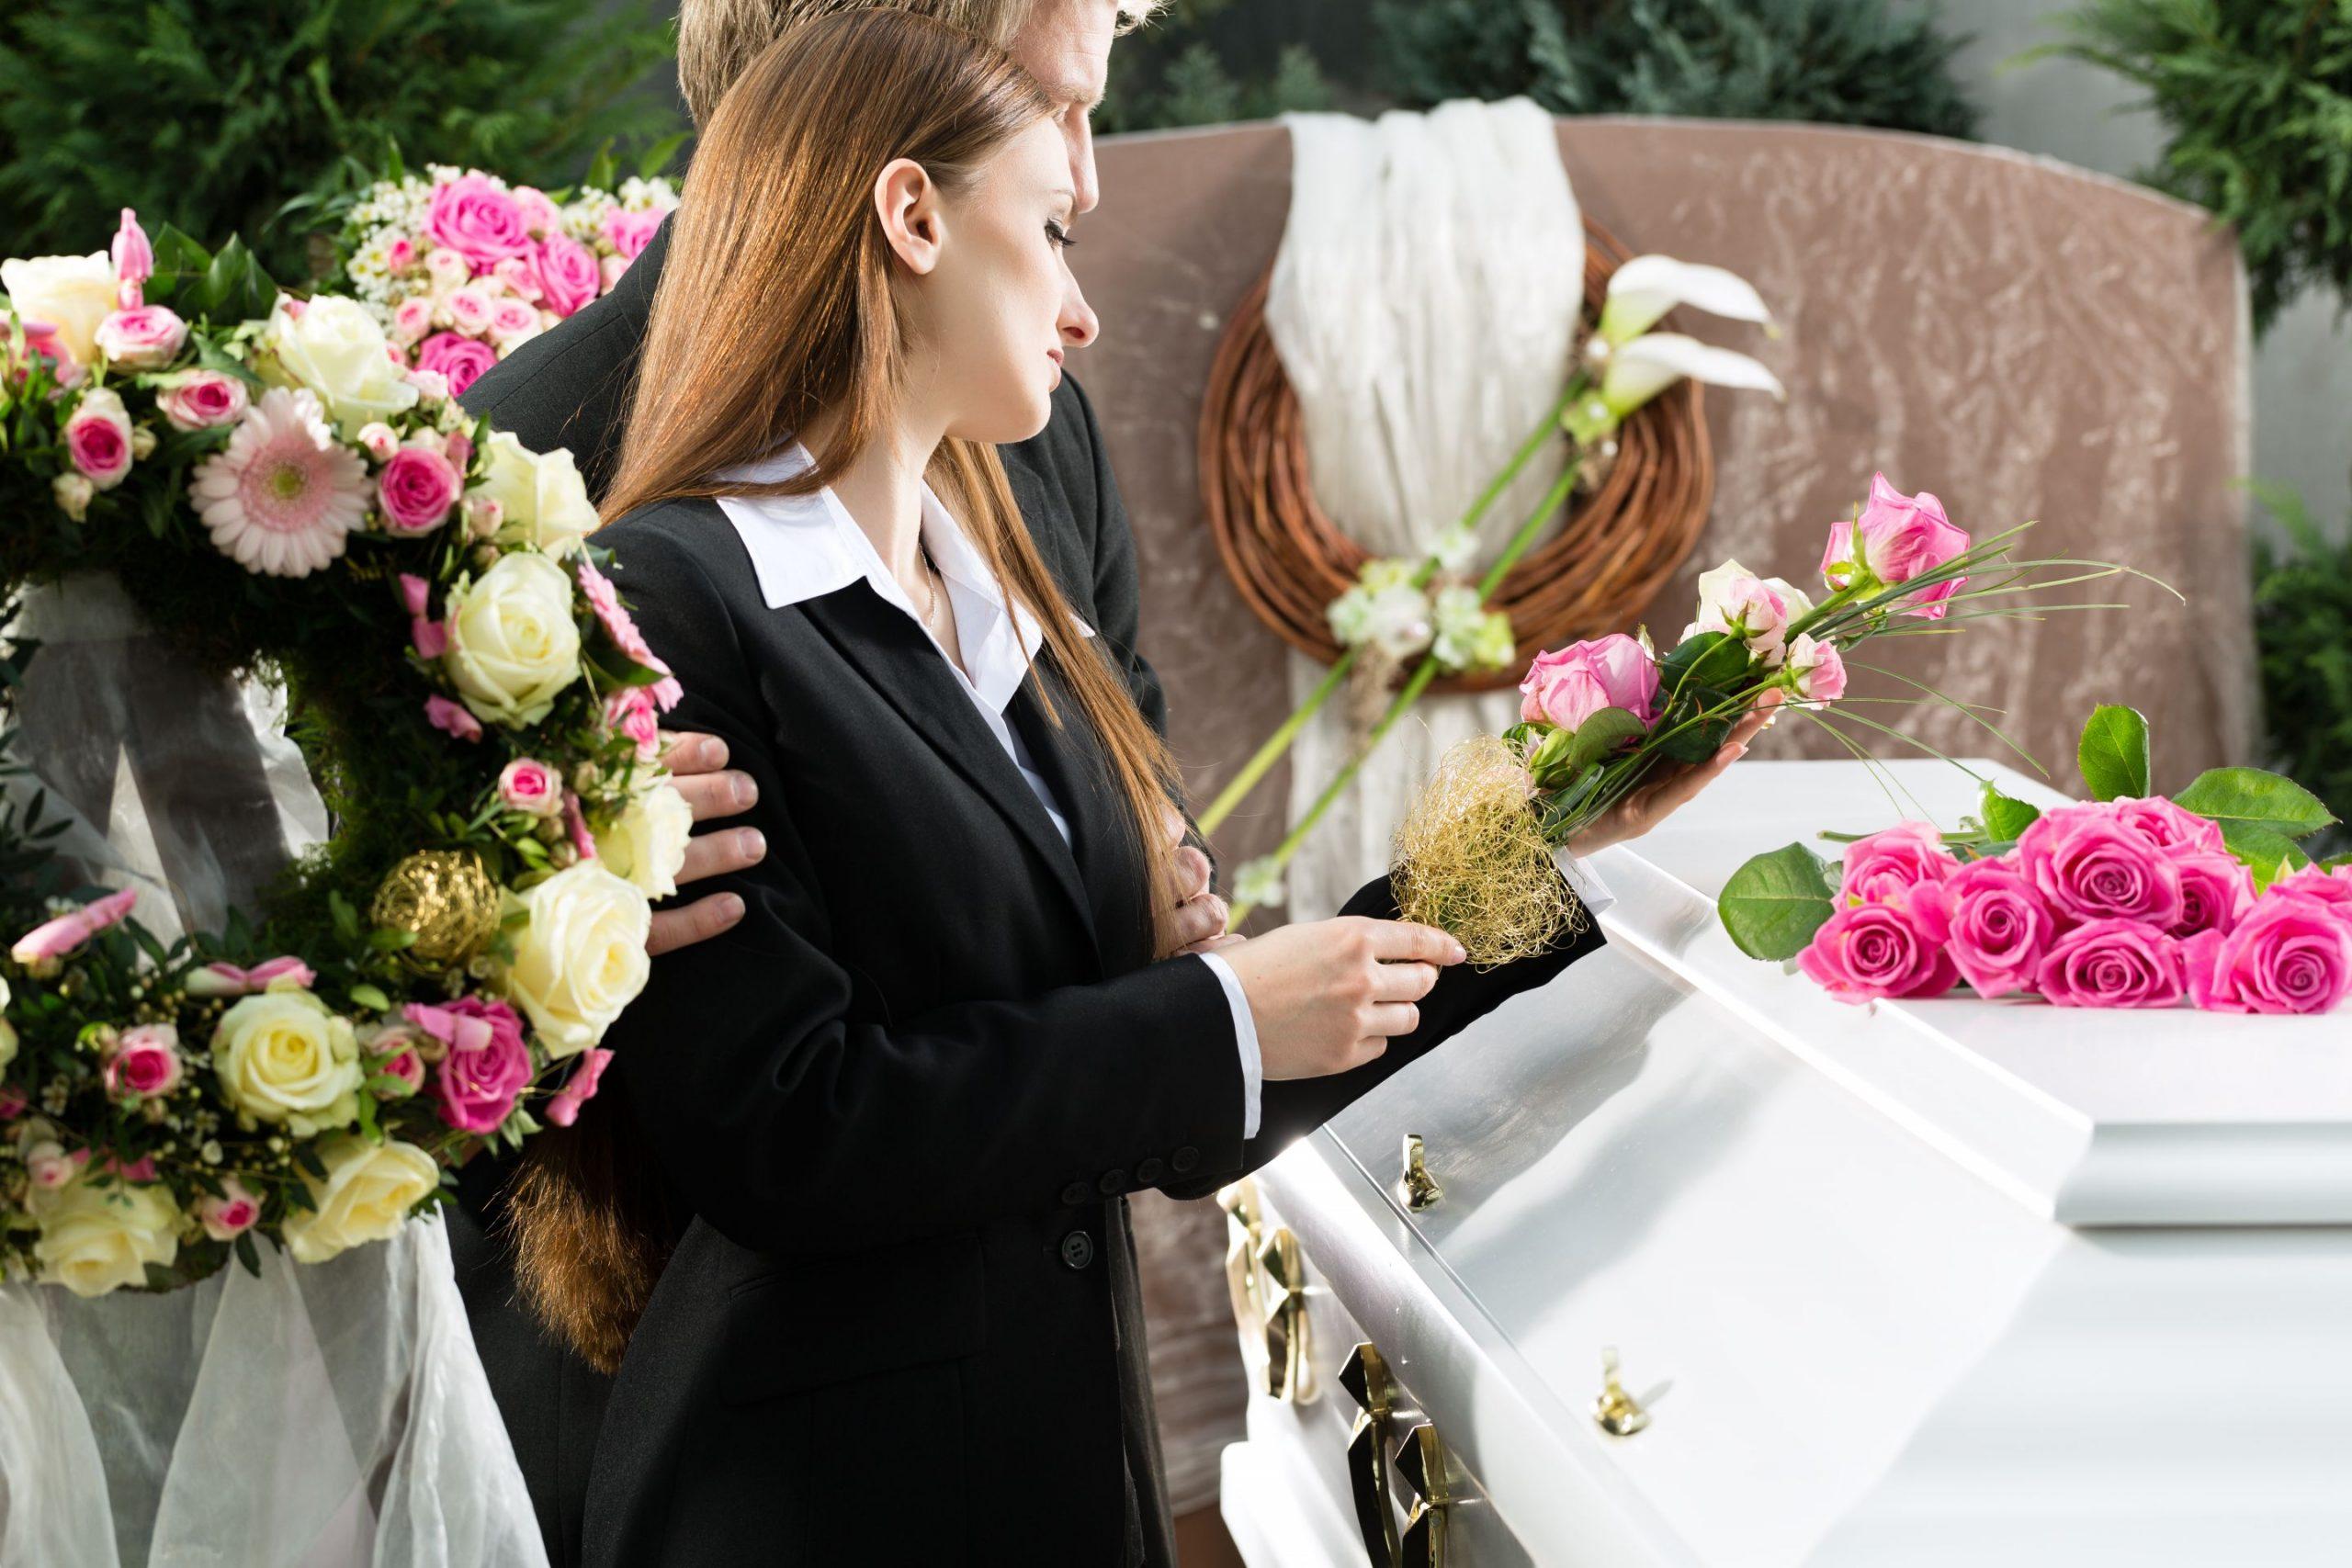 salon funeraire joliette prearrangements